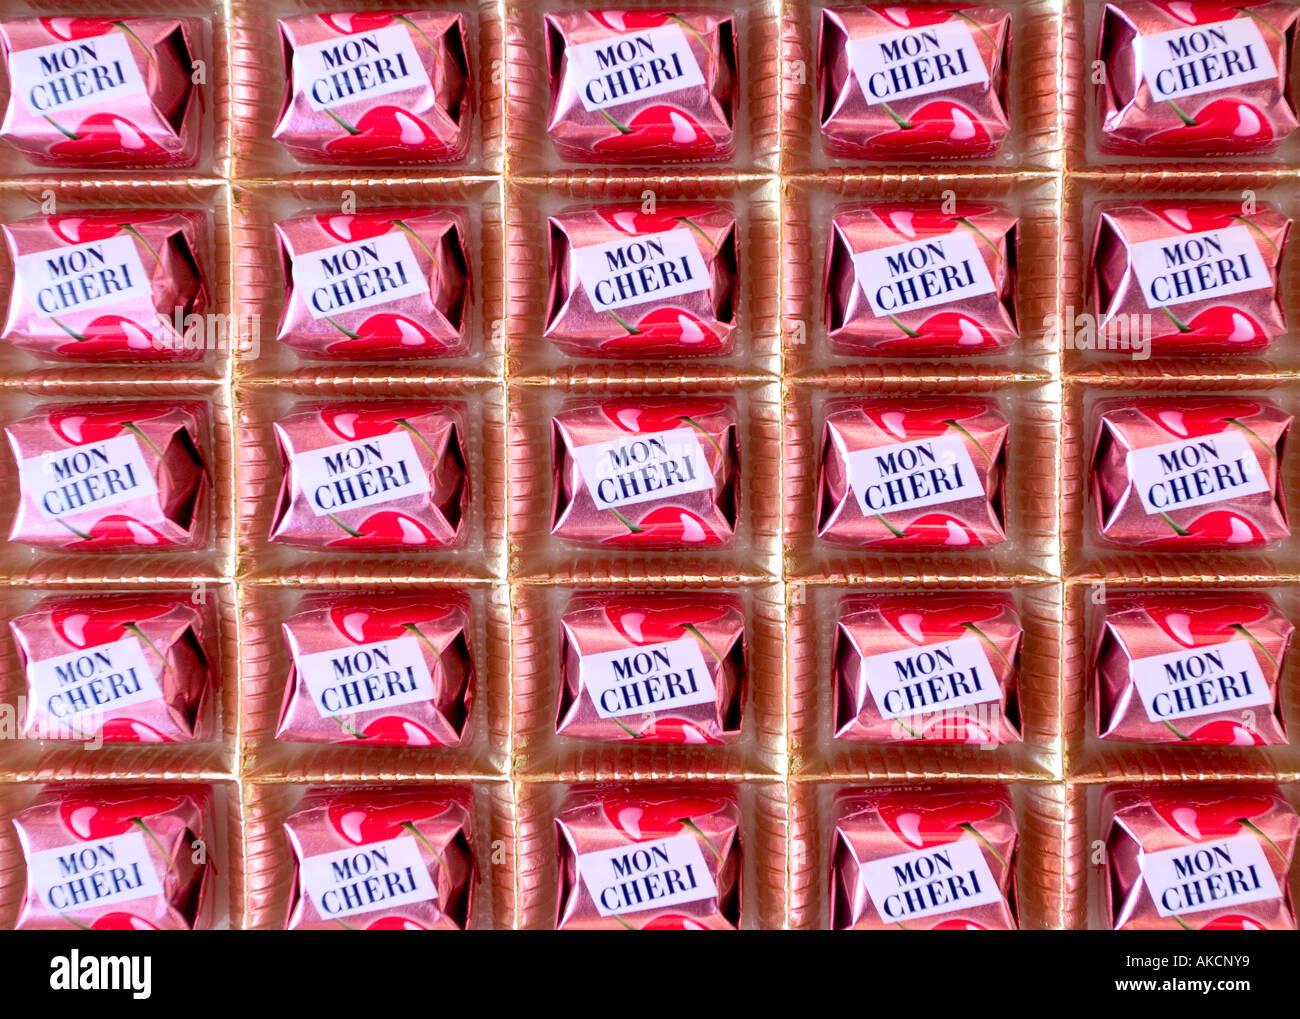 mon cheri french famous chocolate Stock Photo, Royalty Free Image ...